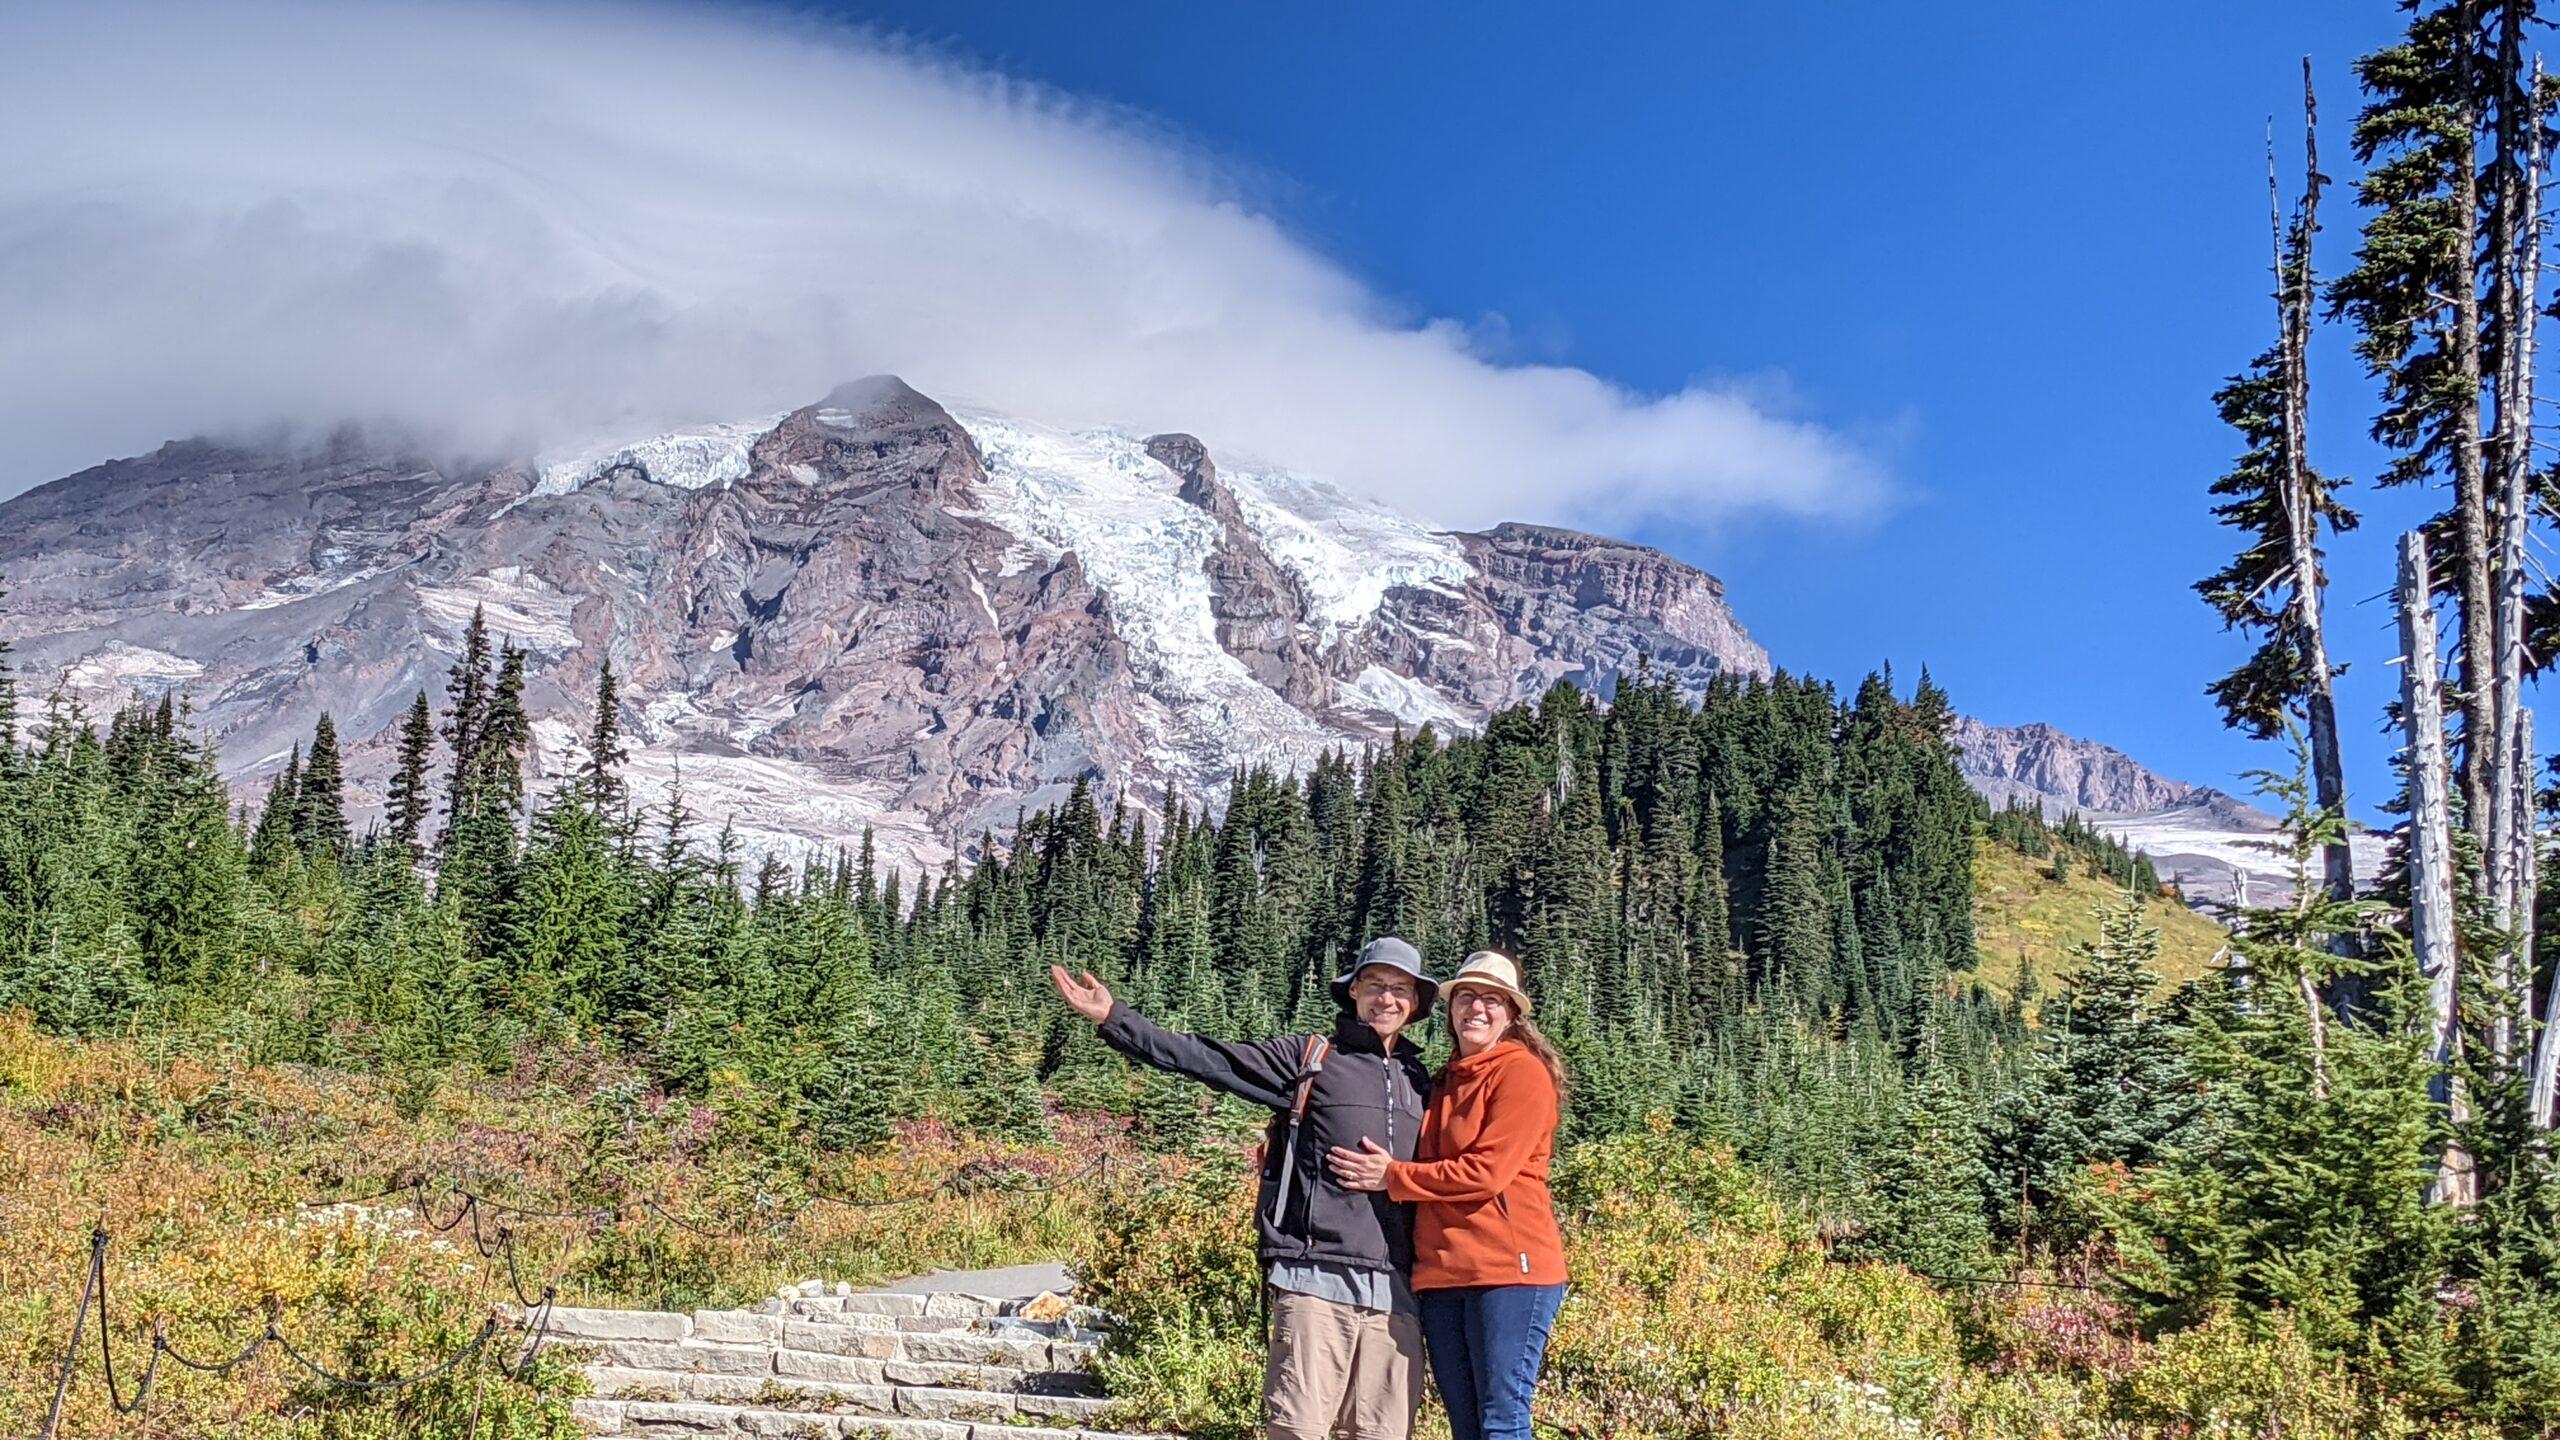 Couple in front of Mount Rainier